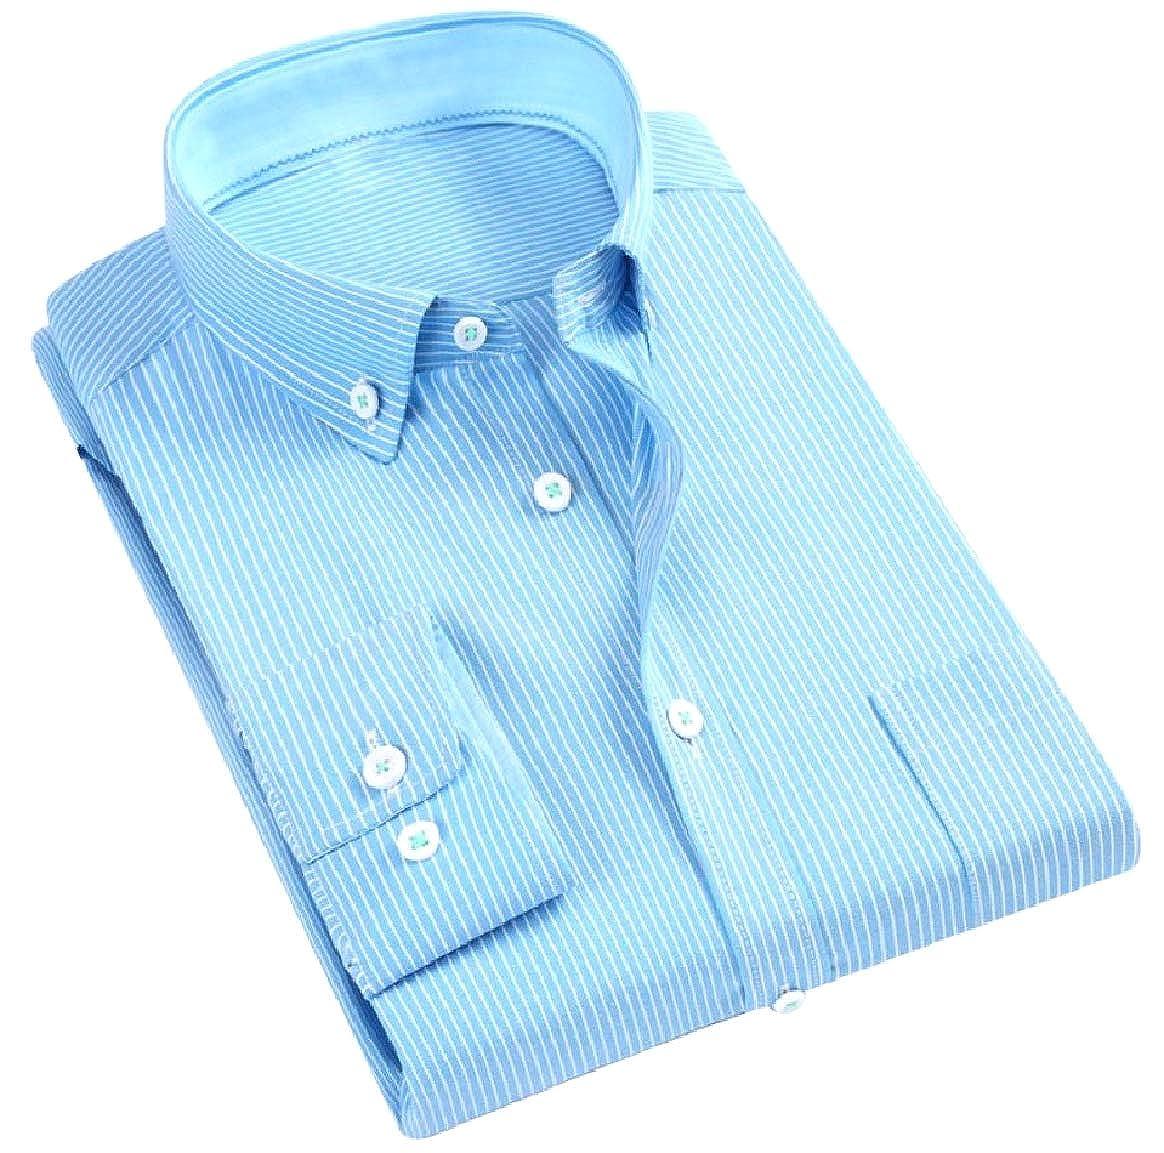 Tootless-Men Oxford Cotton Wrinkle-Free Long Sleeve Western Shirt